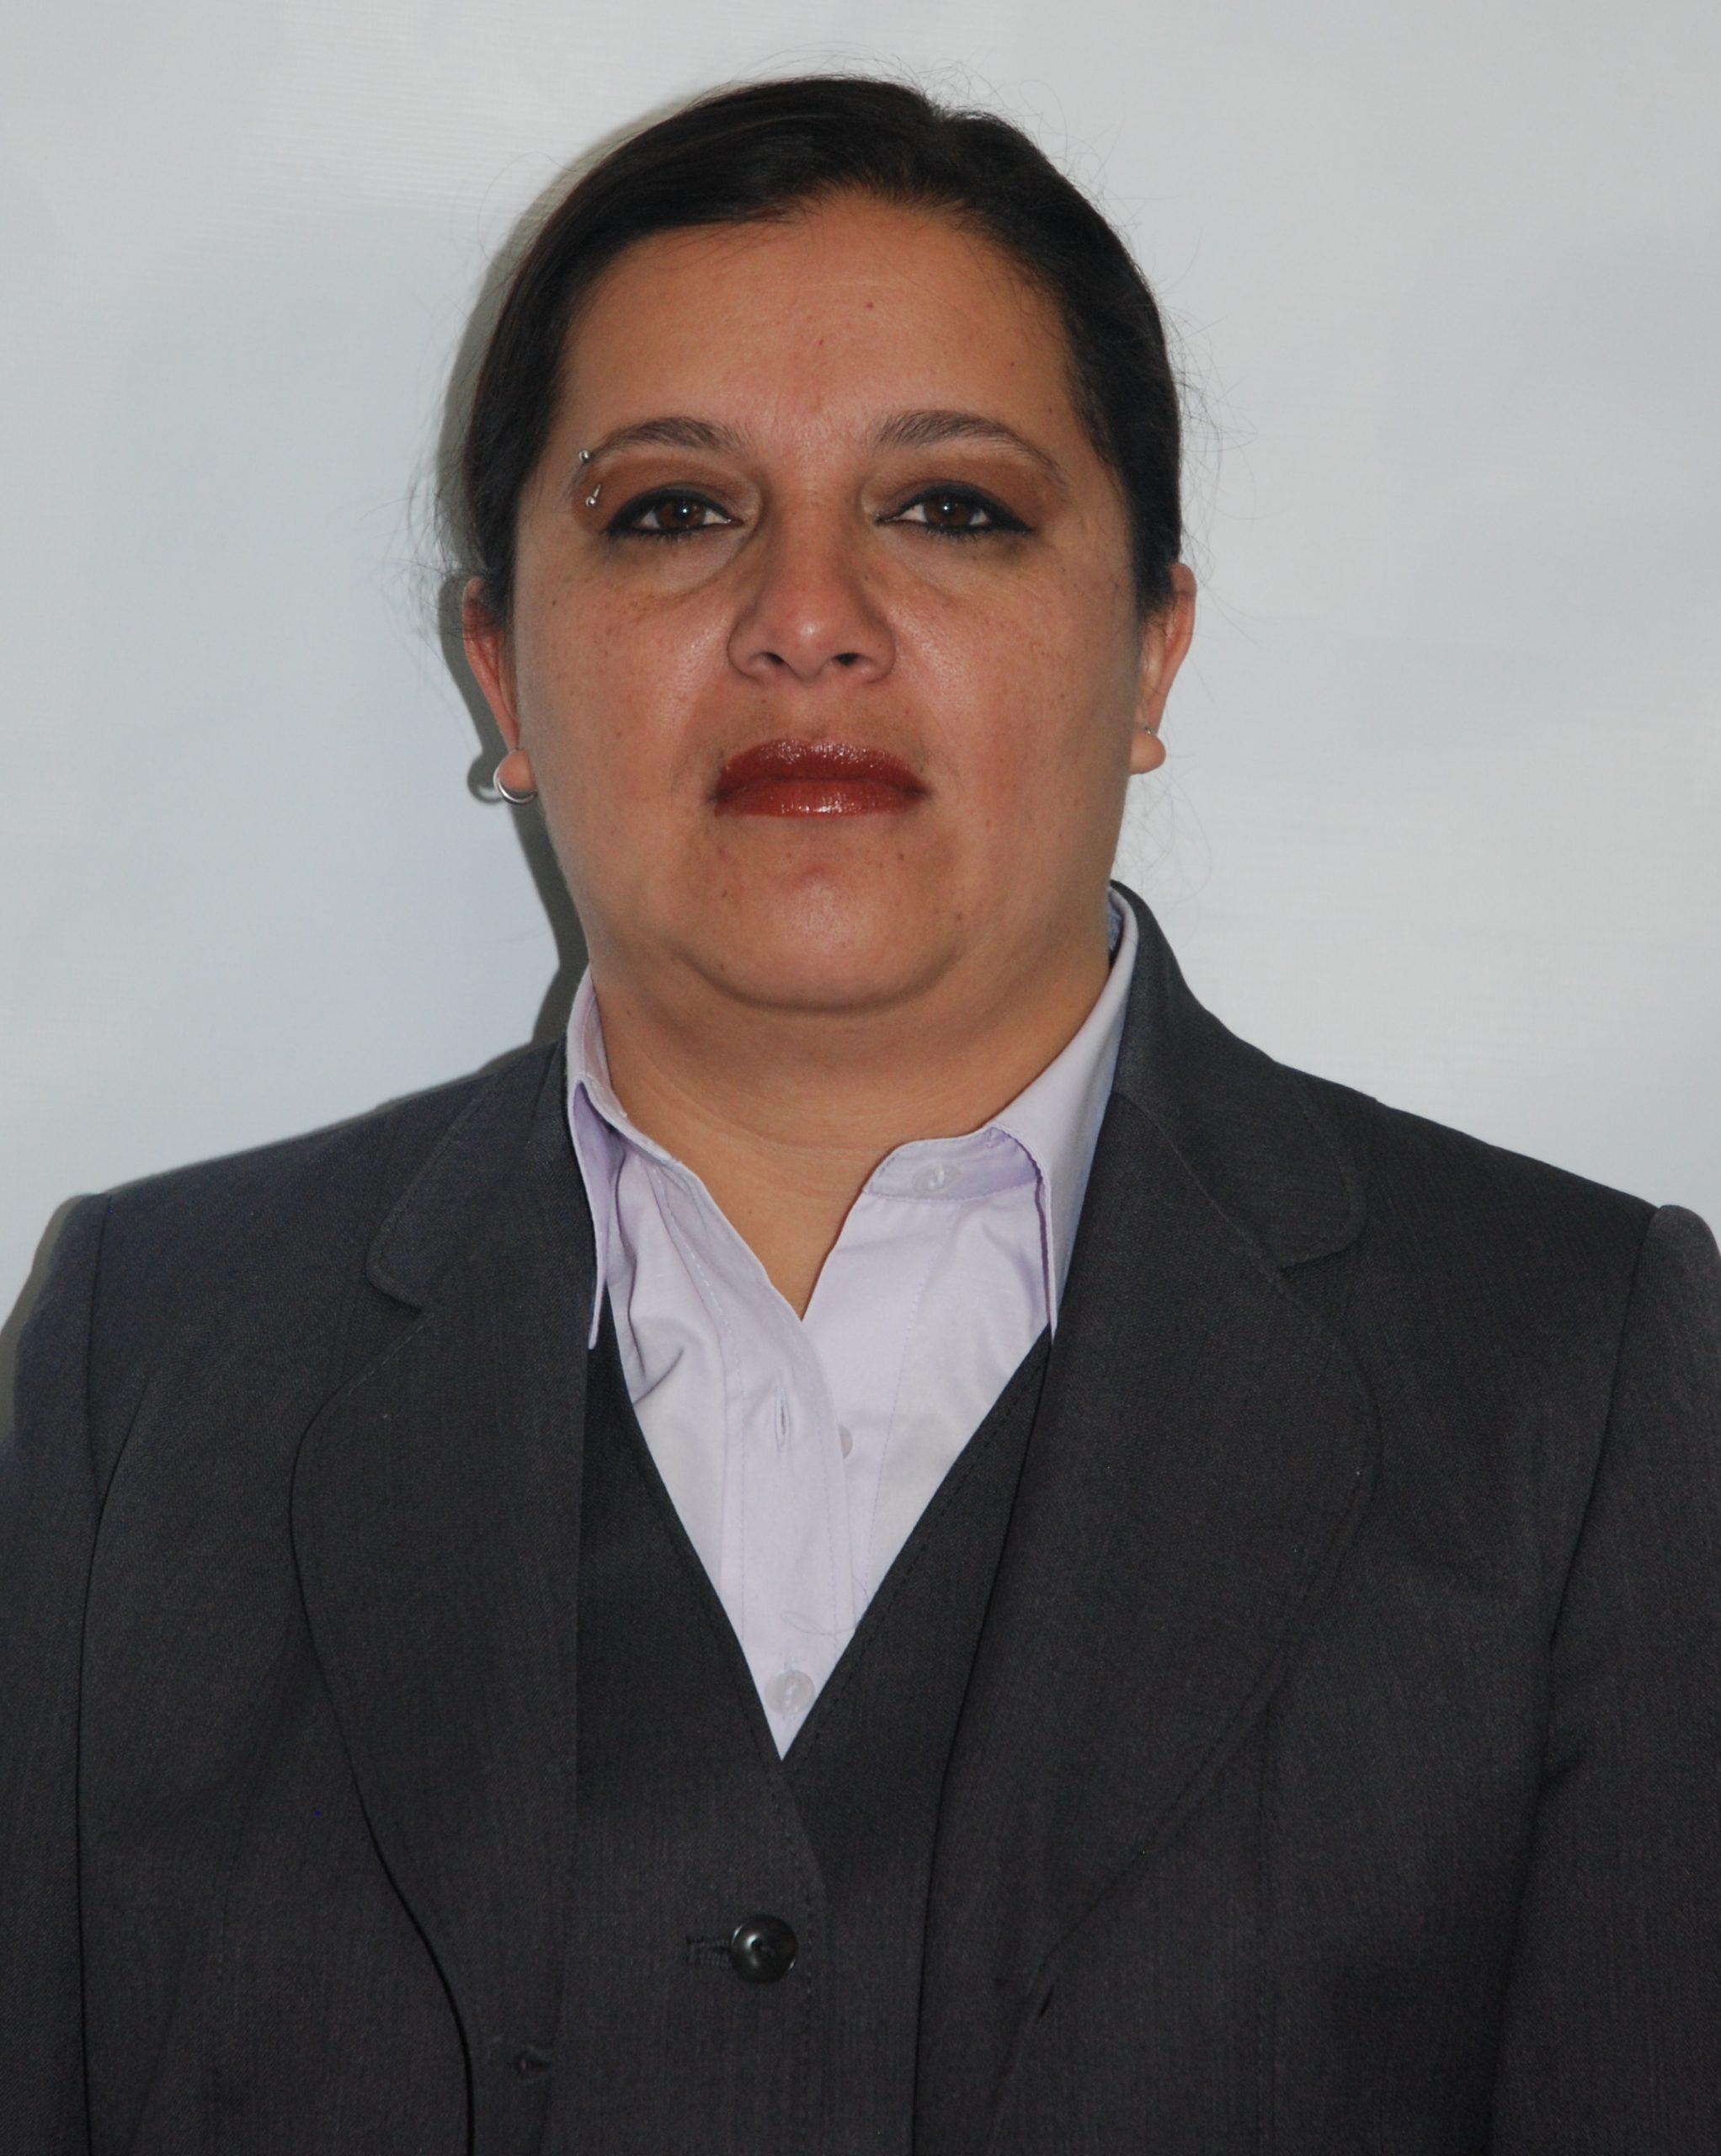 Marianela Murgueitio